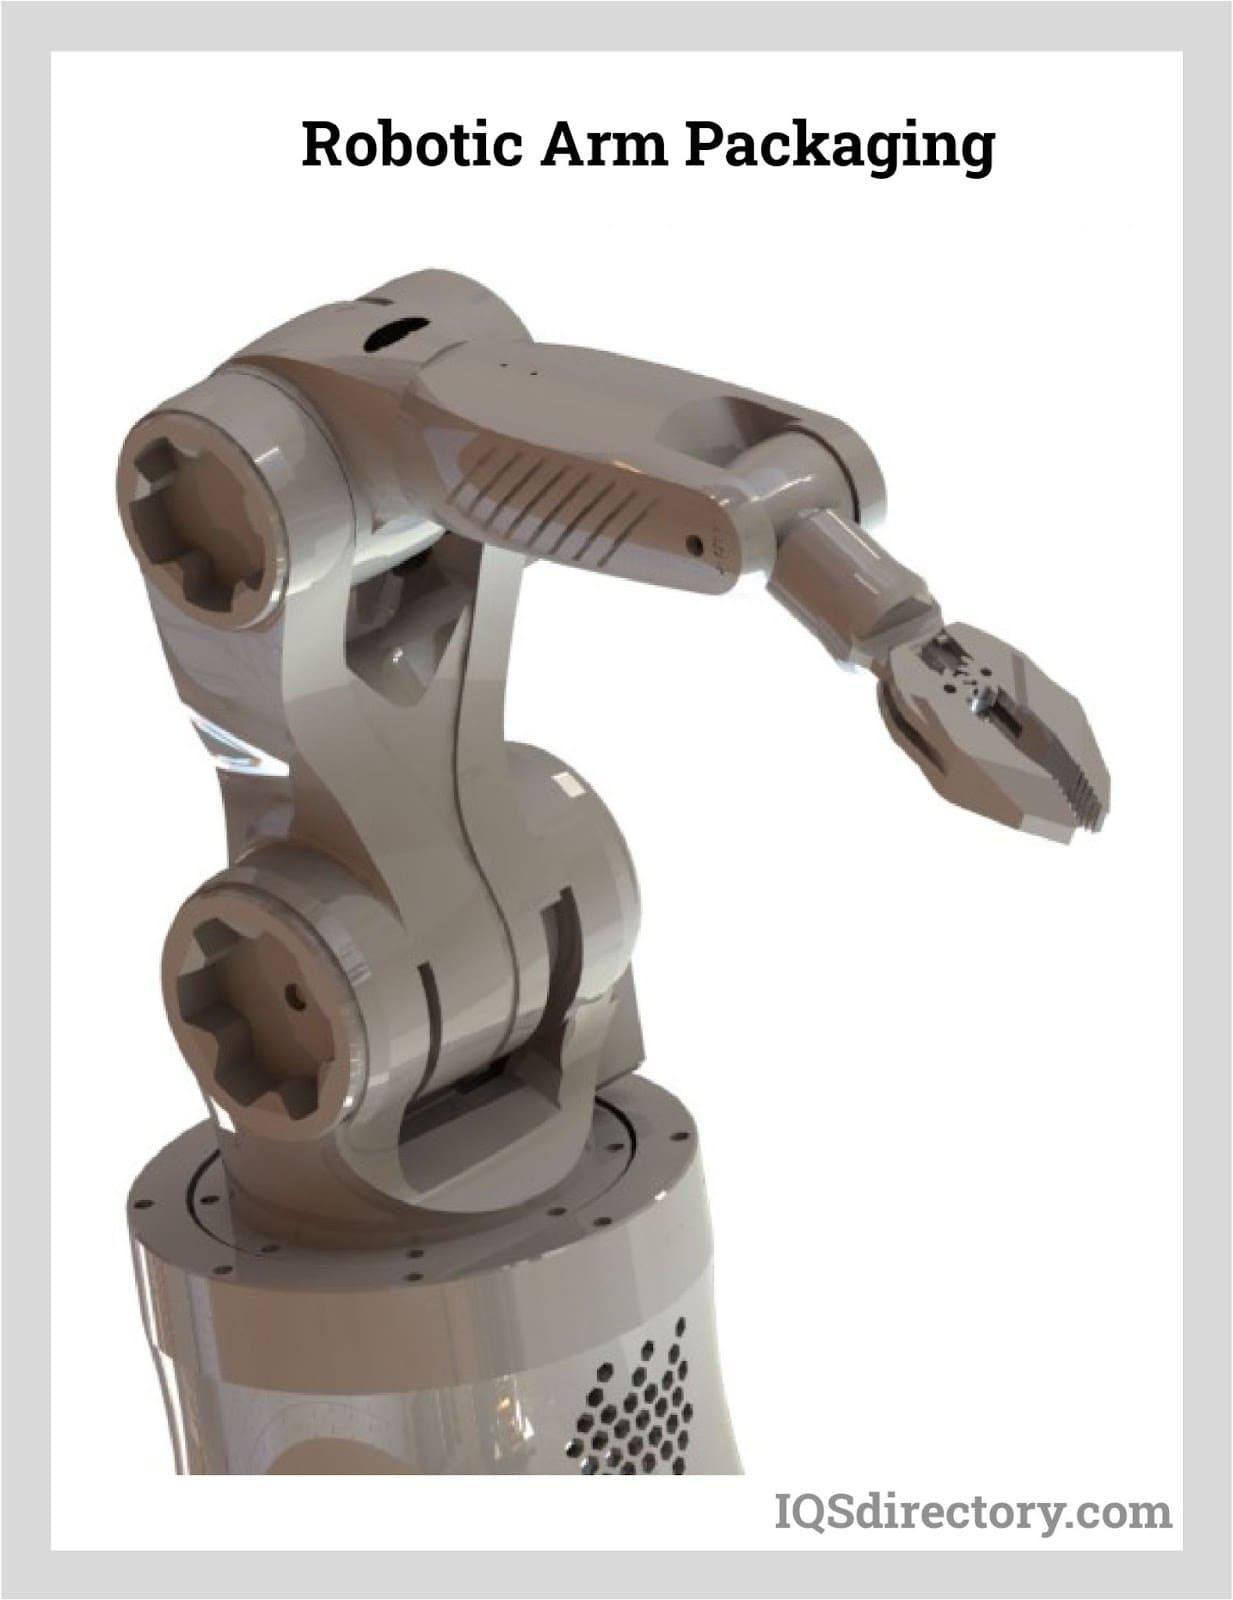 Robotic Arm Packaging